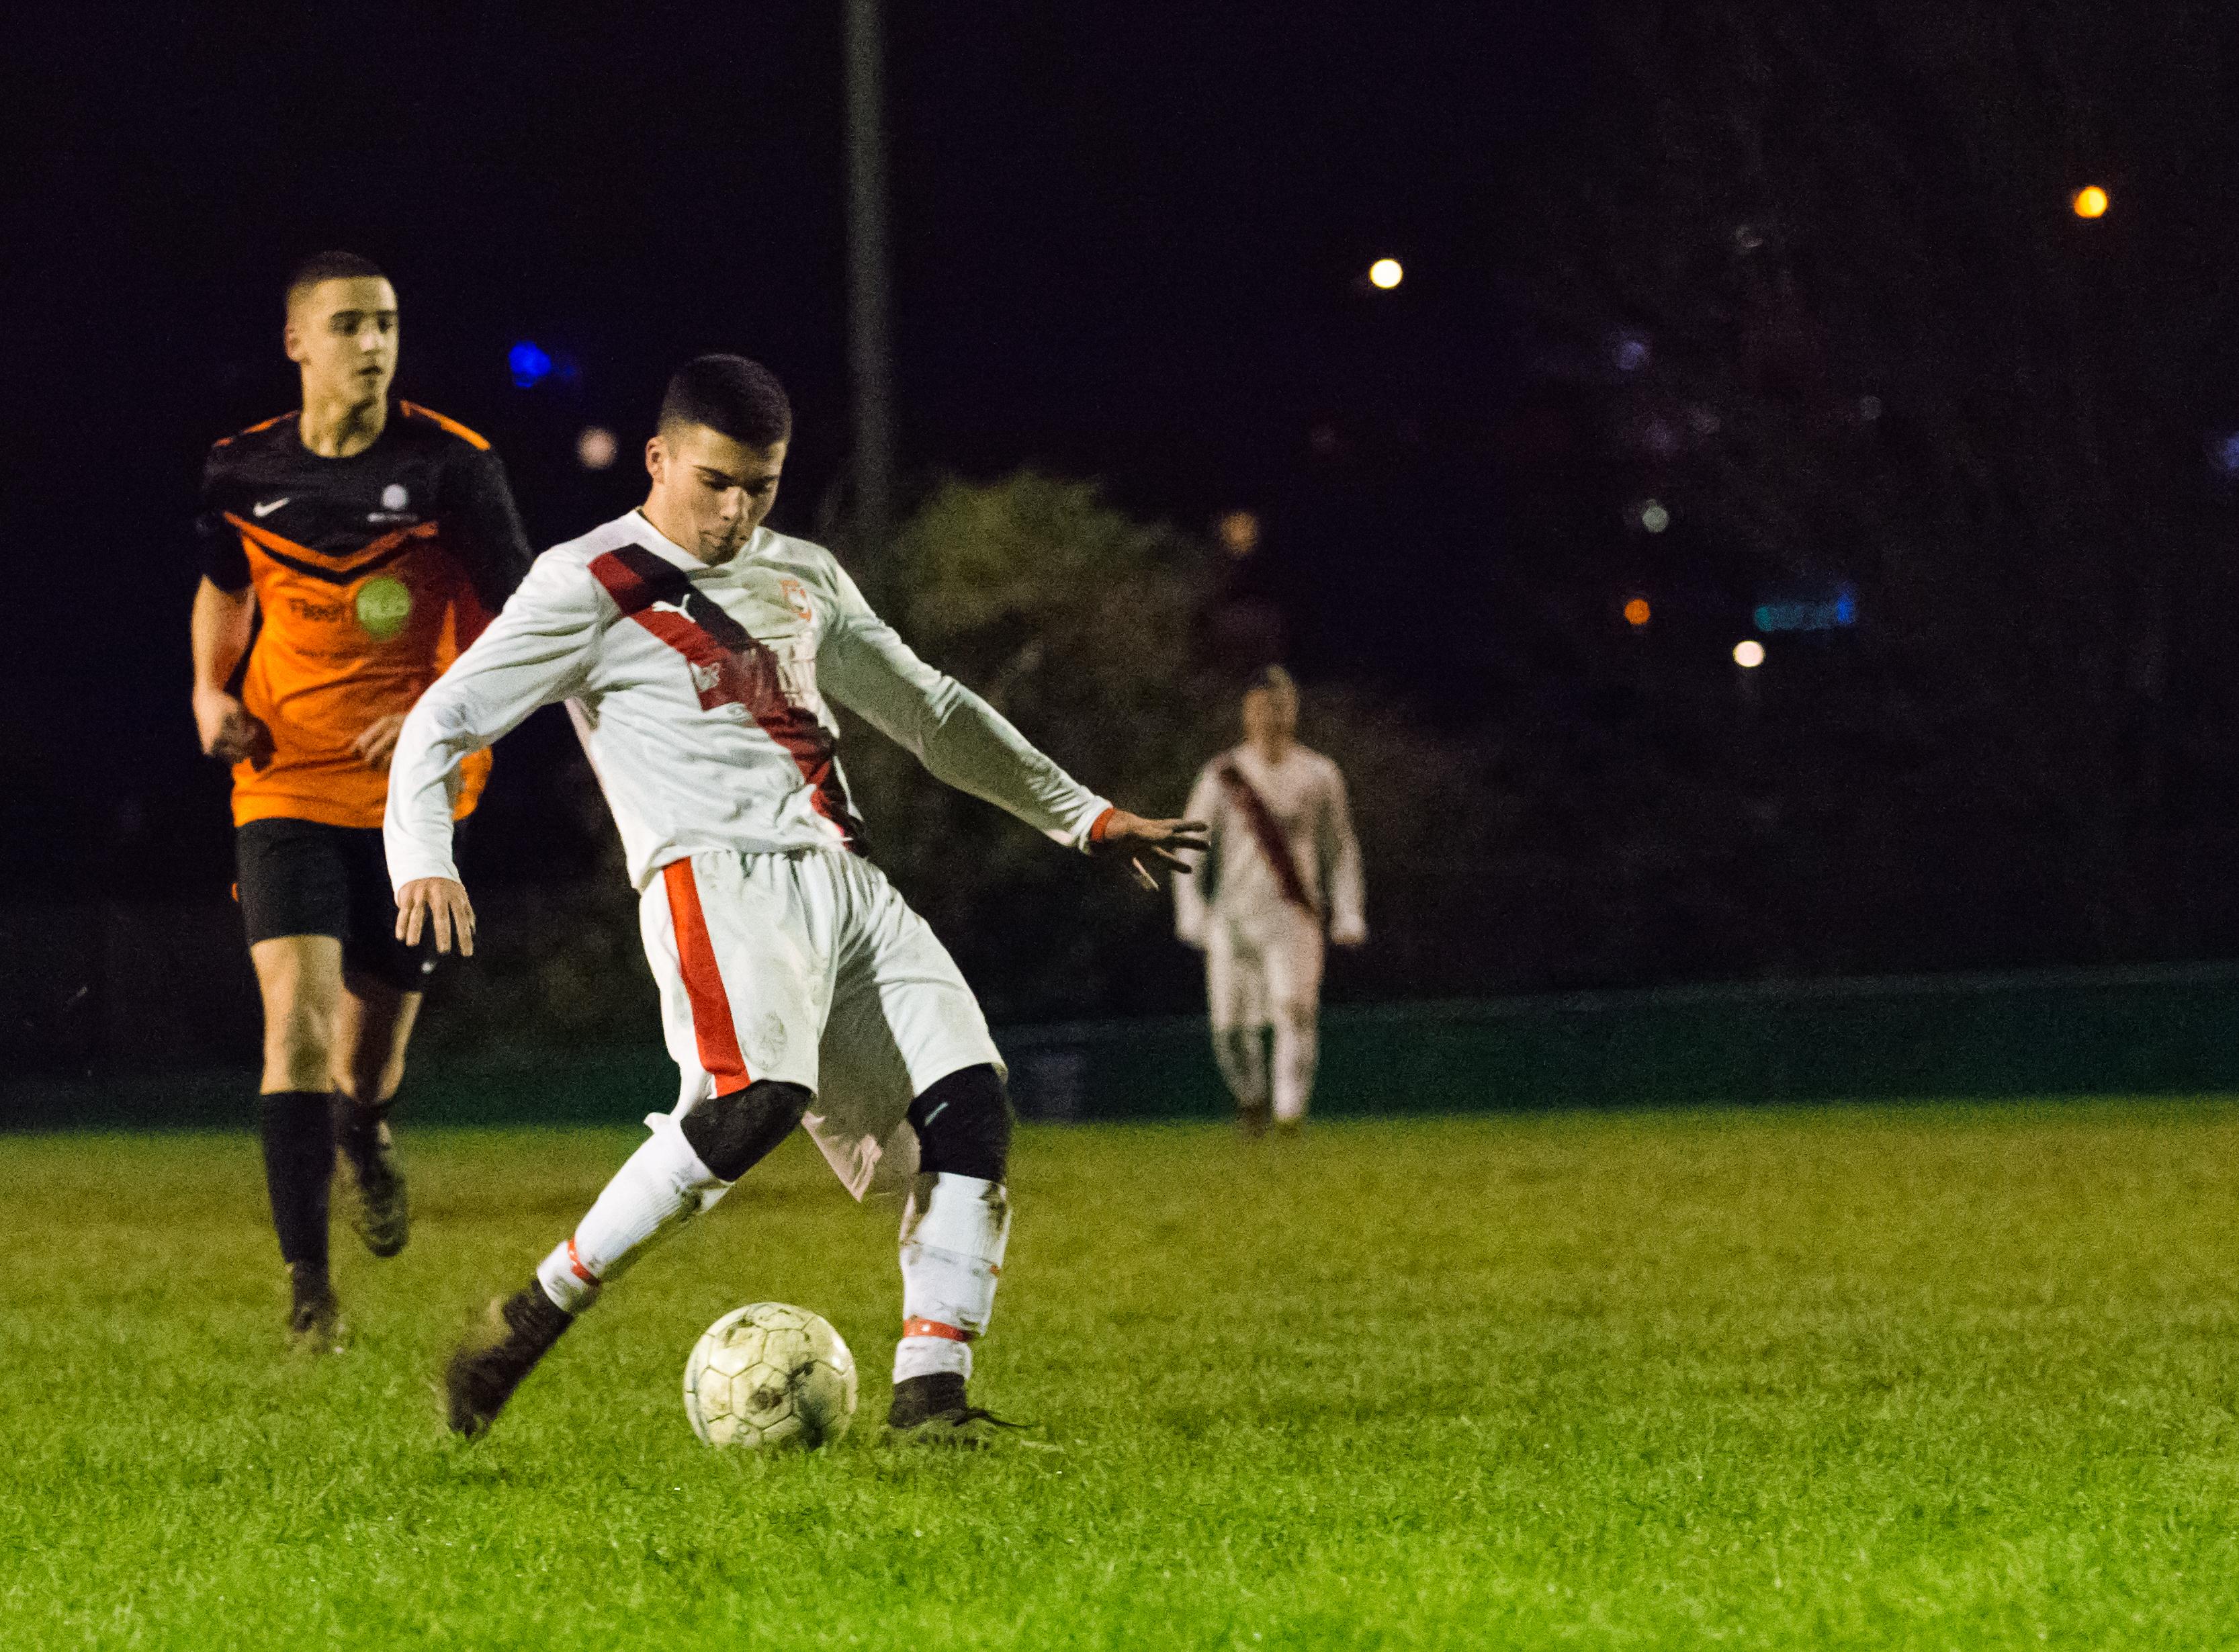 Mile Oak U21s vs Southwick FC U21s 14.12.17 30